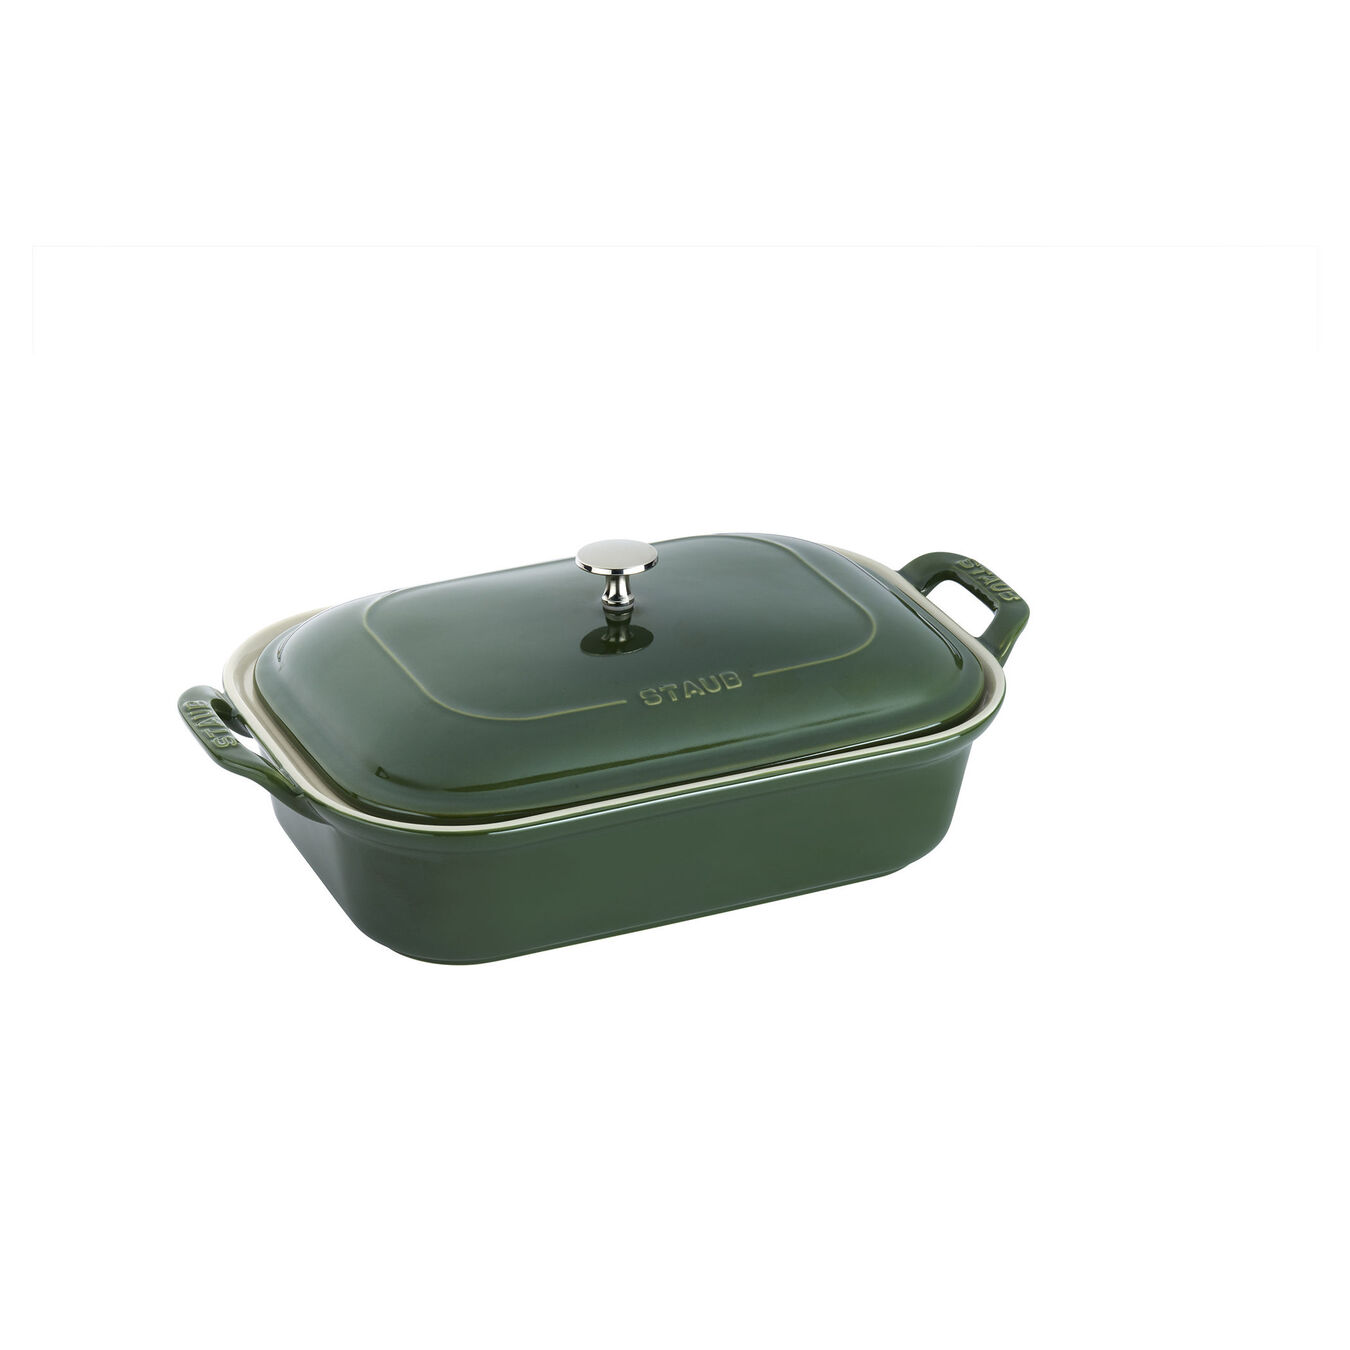 12-inch x 8-inch Rectangular Covered Baking Dish - Basil,,large 1